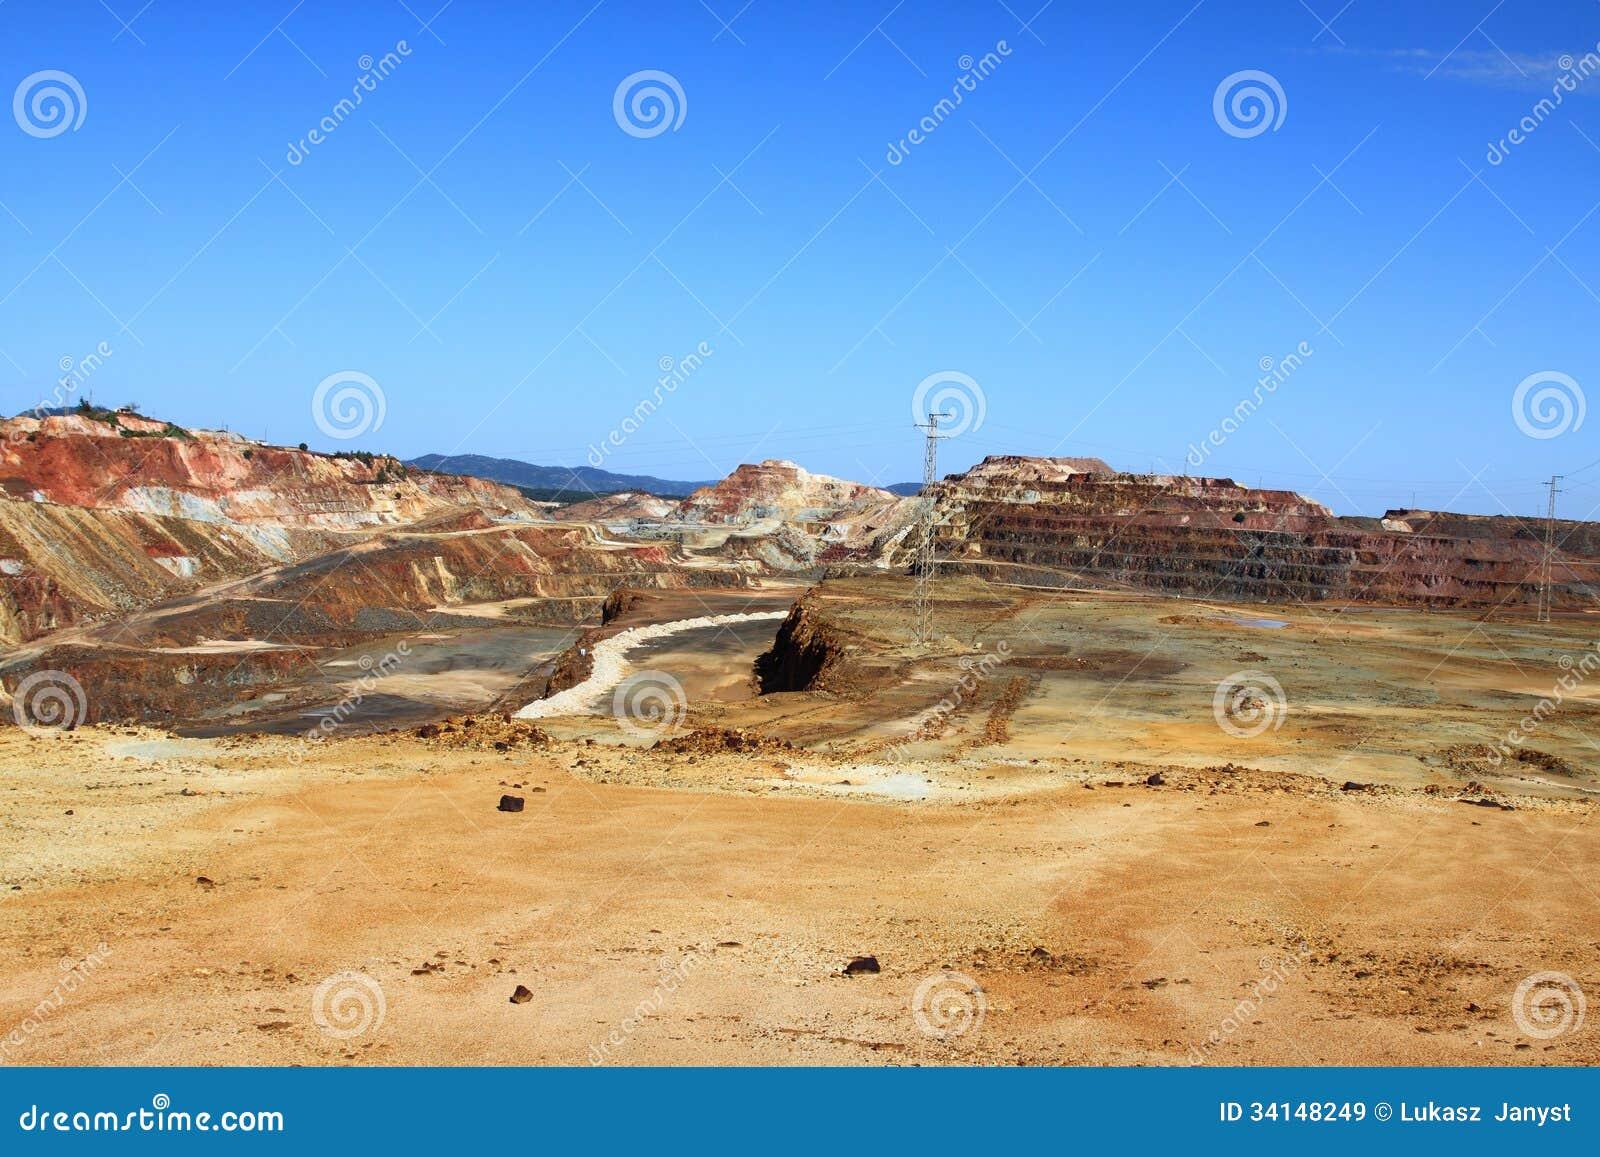 Minas De Riotinto Nerva Huelva Province Andalus Stock